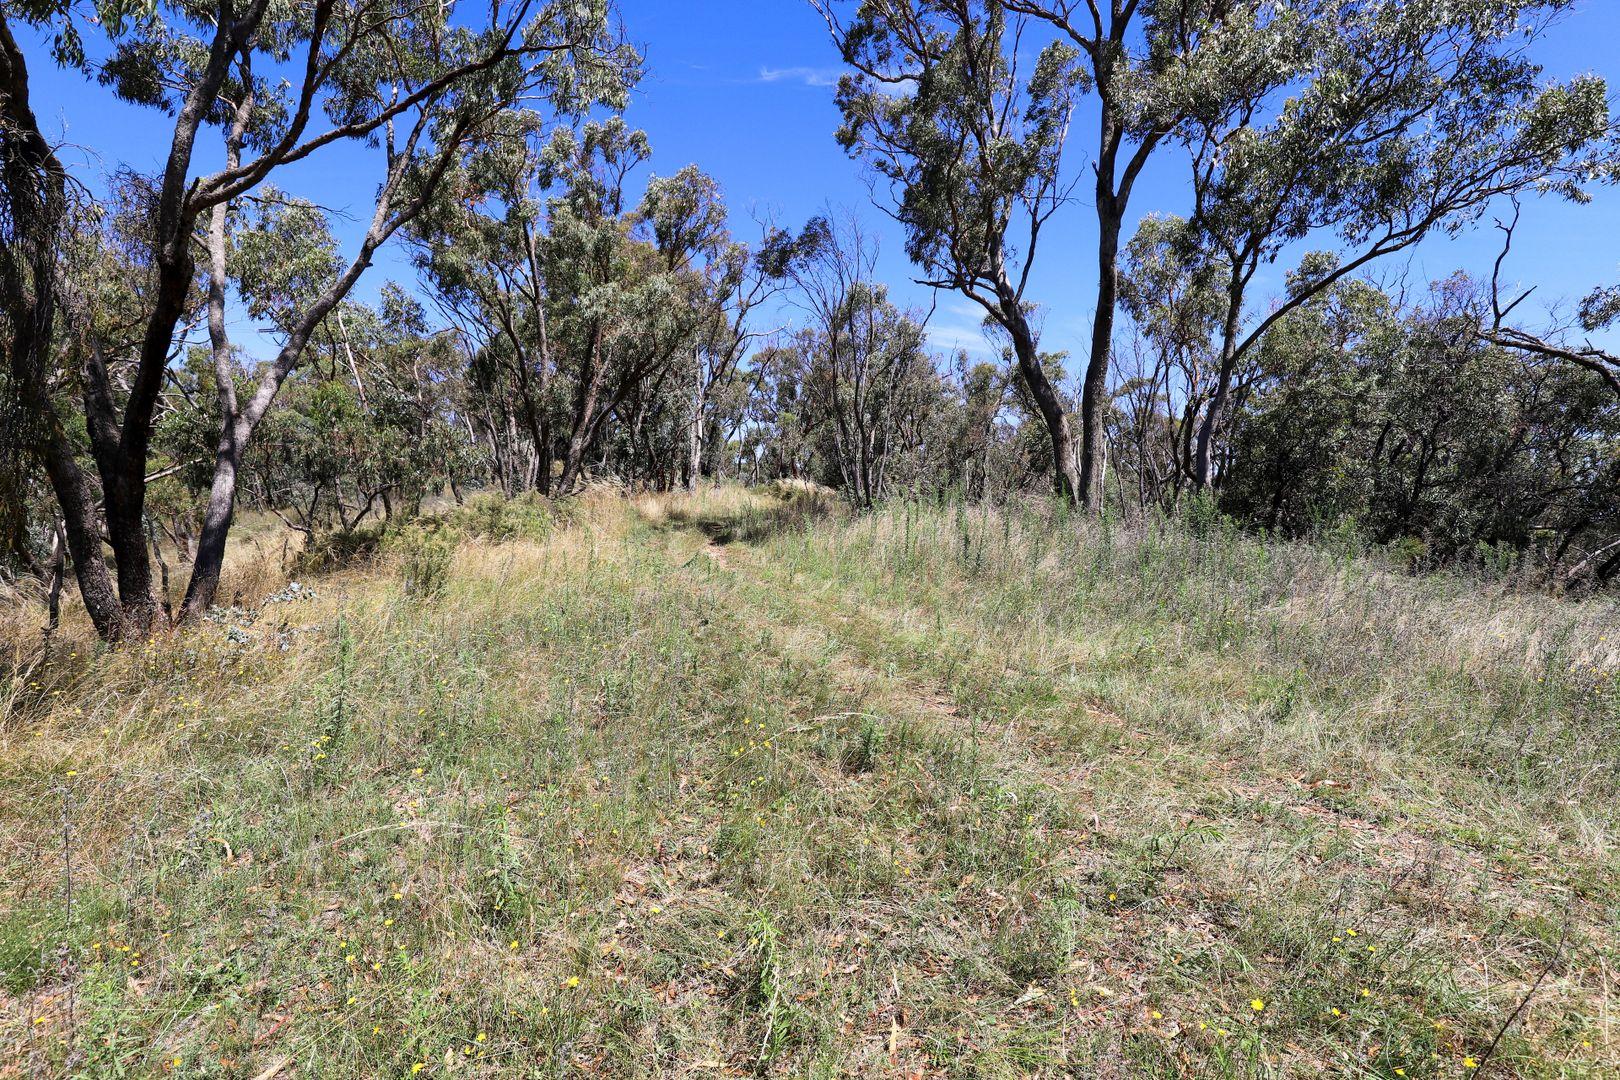 960 Hazelgrove Road Hazelgrove, Oberon NSW 2787, Image 1